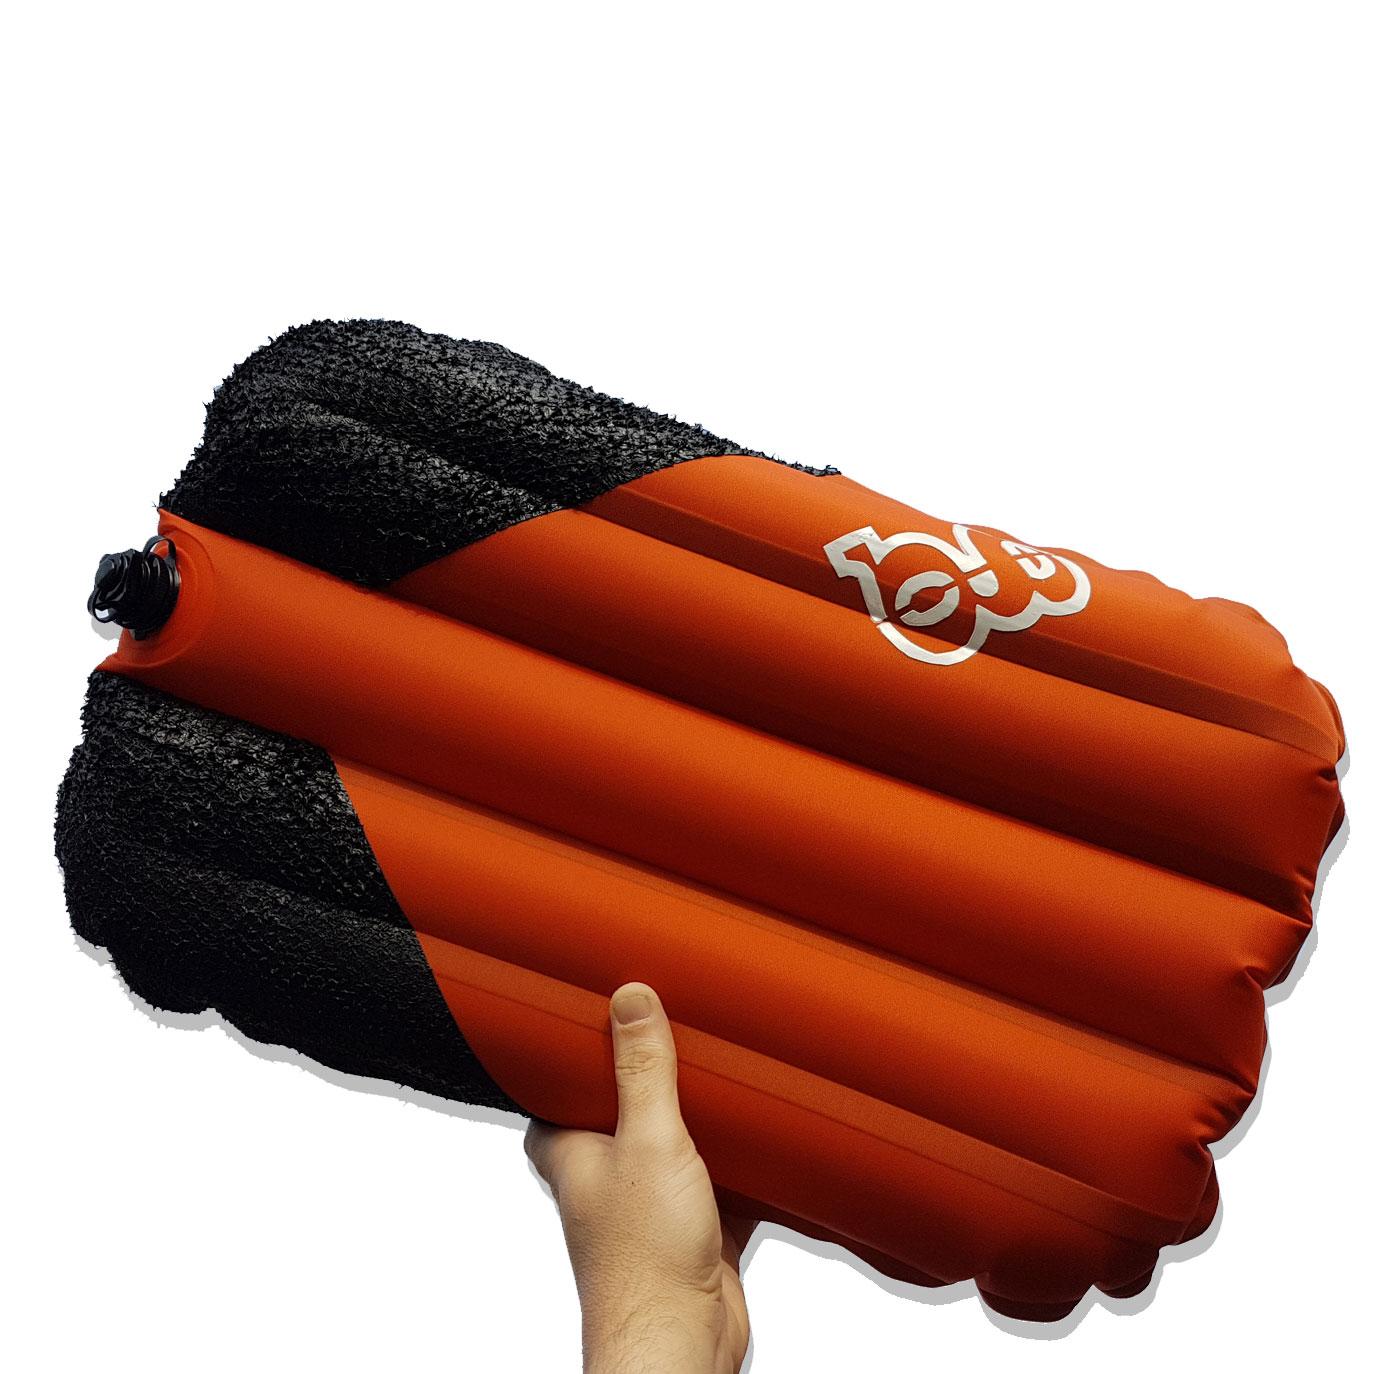 Bodybag Surfmat